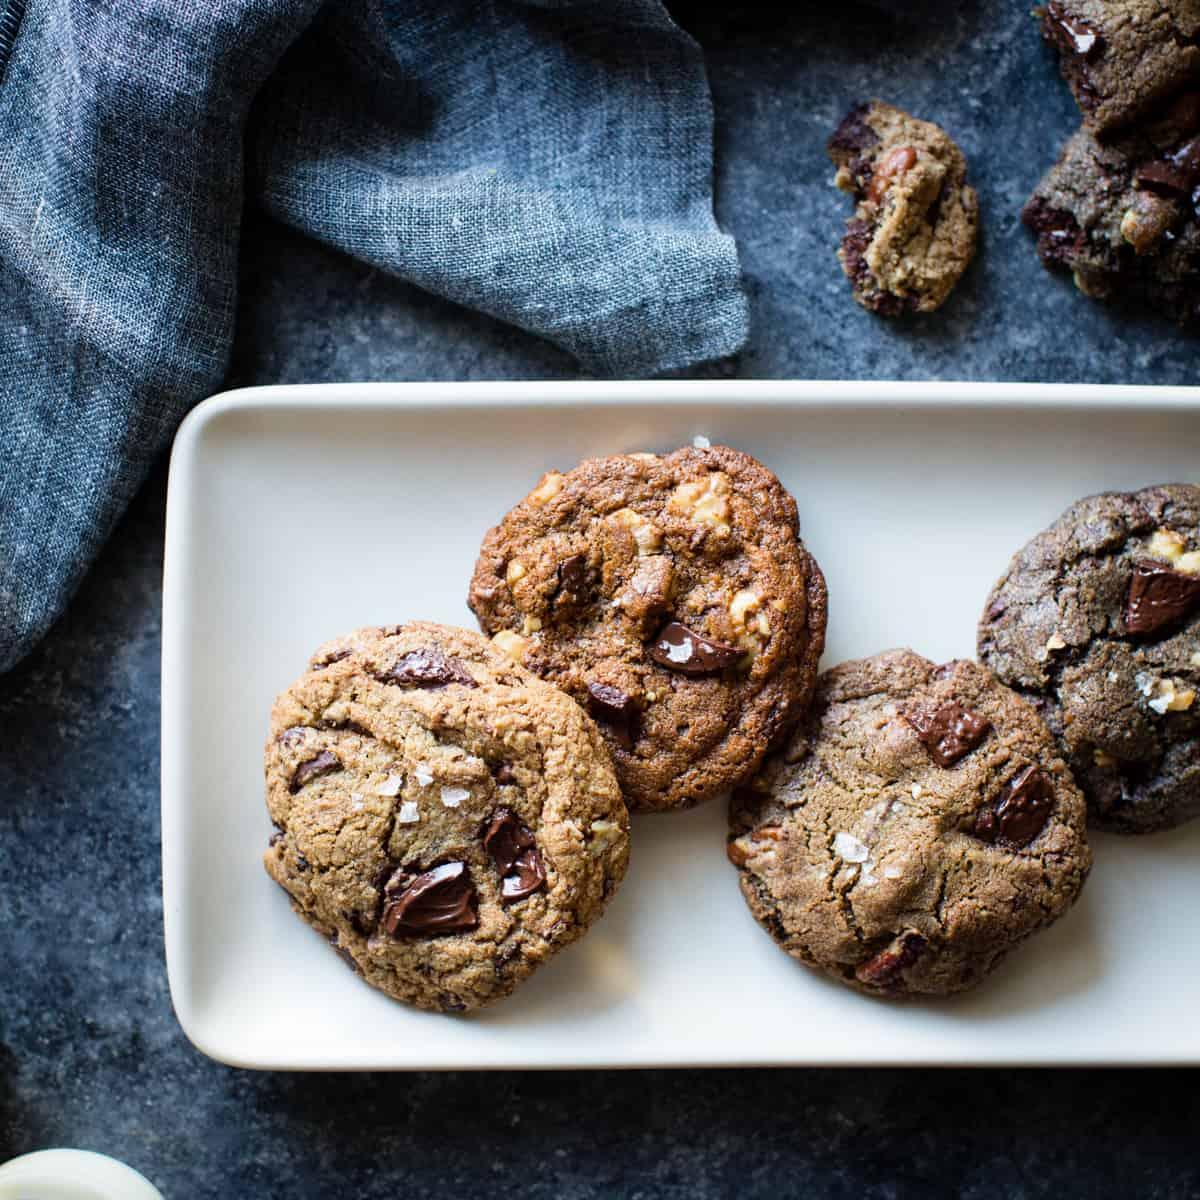 Gluten-Free Chocolate Chip Cookies on dish